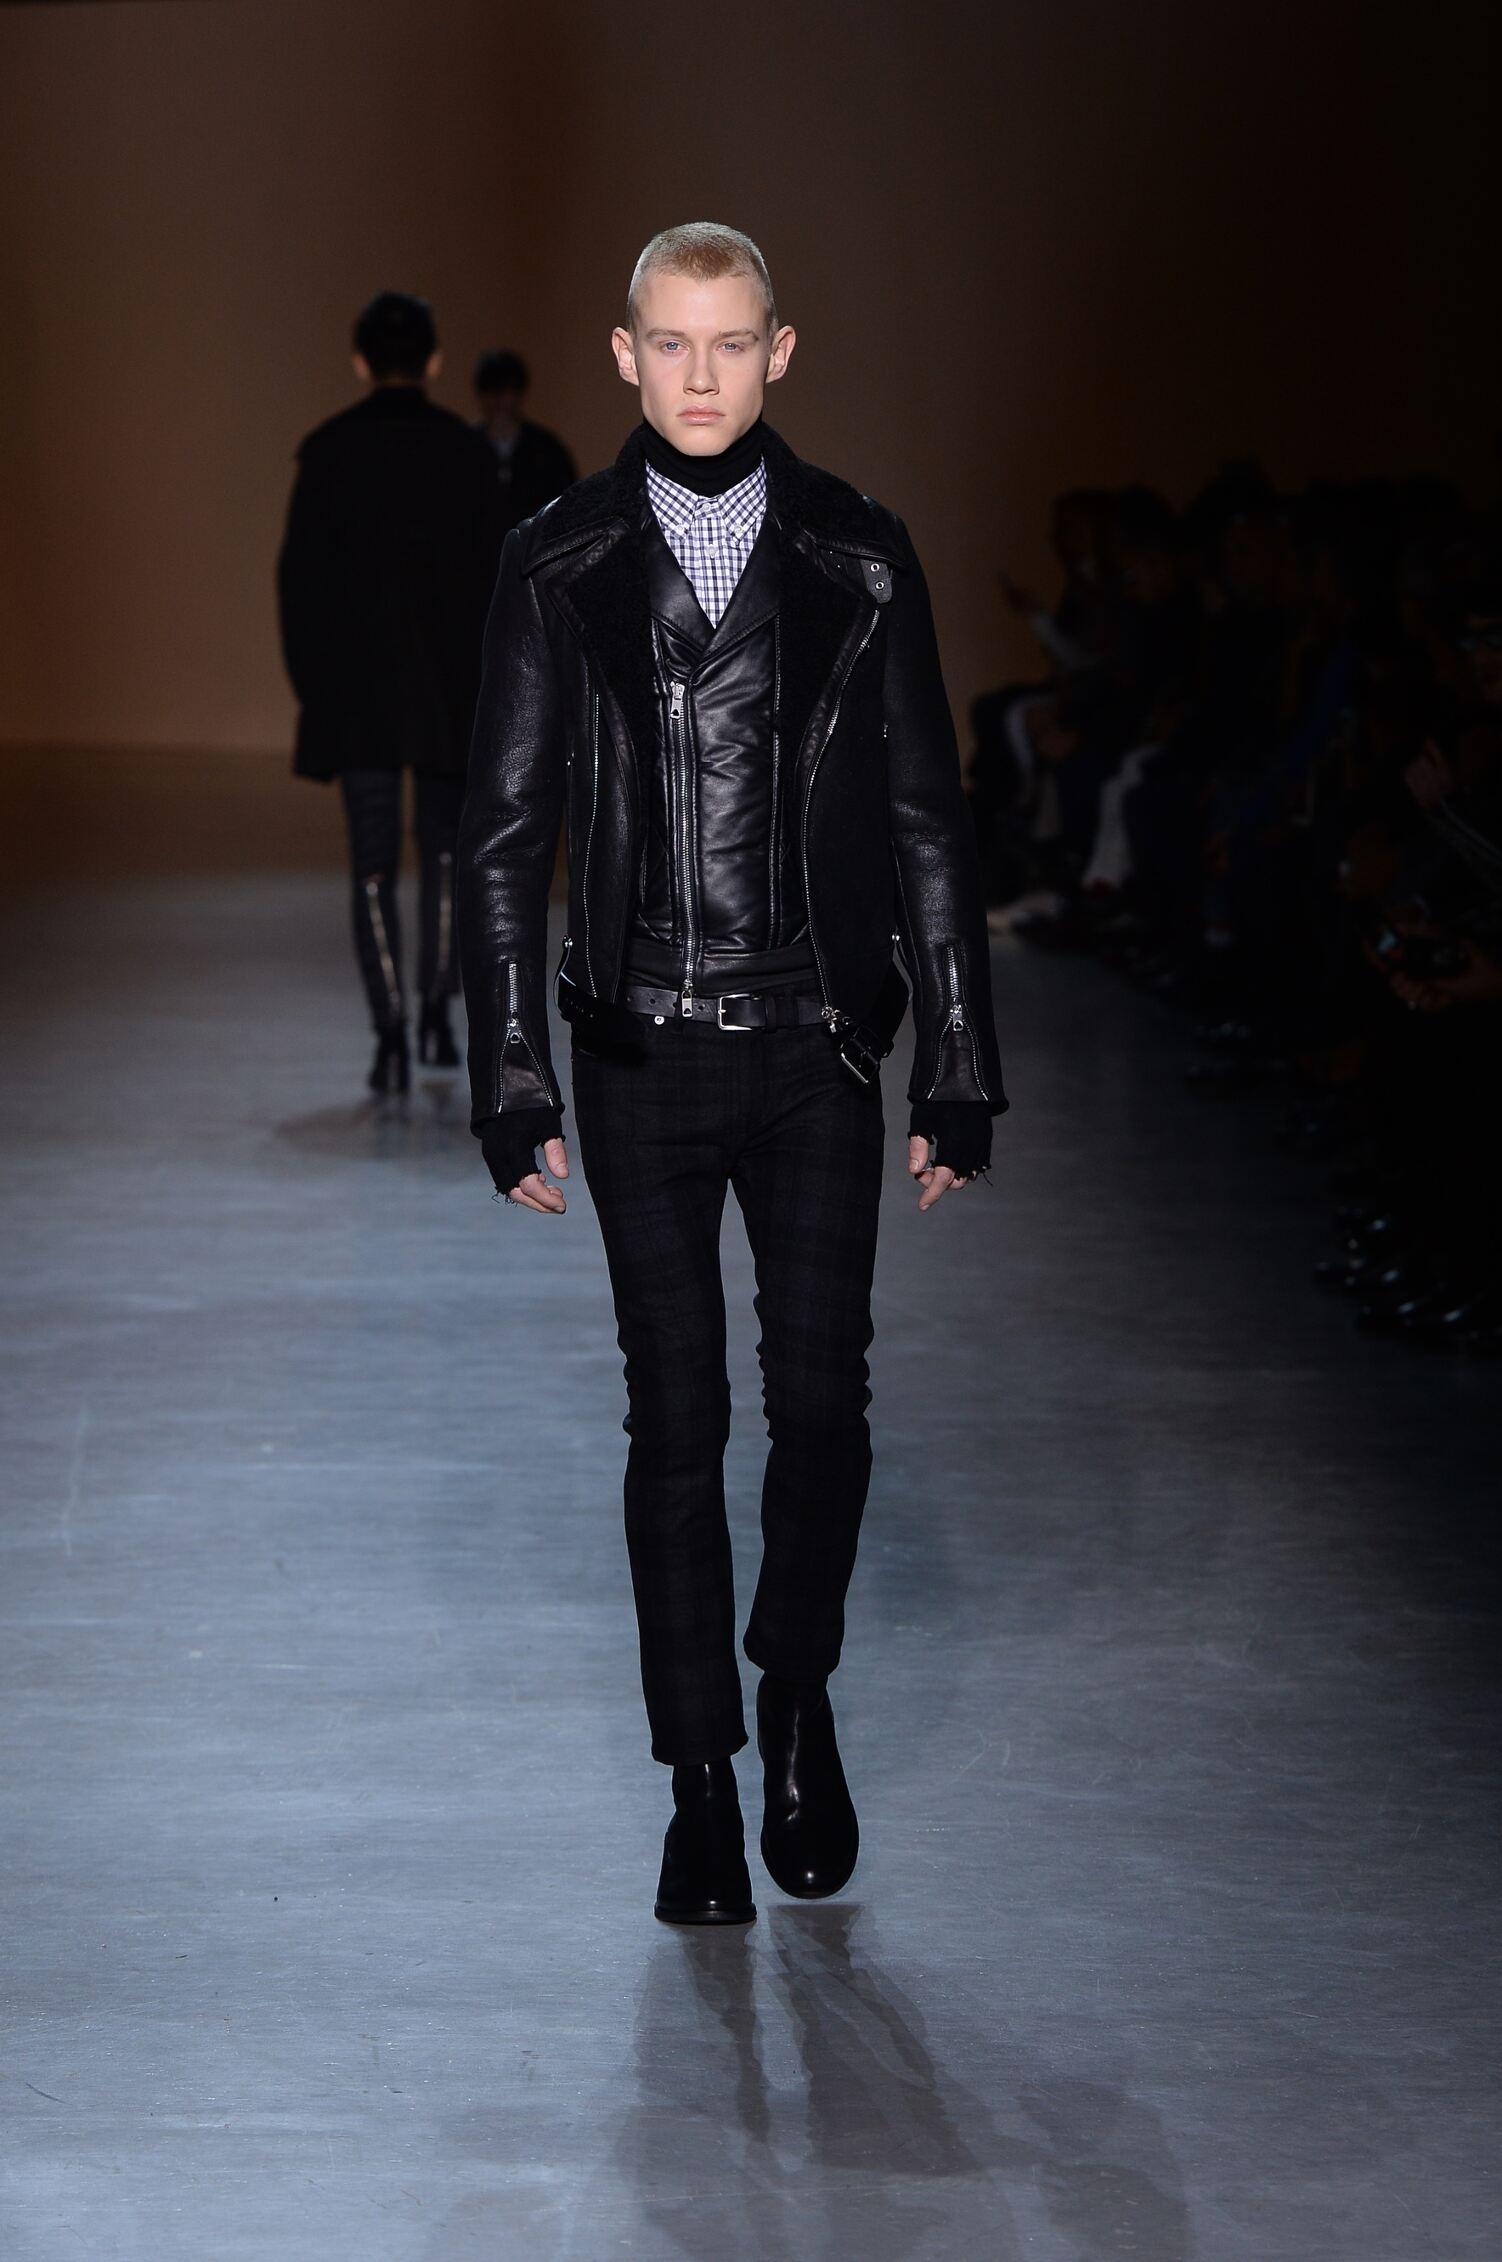 Fashion Man Model Diesel Black Gold Catwalk